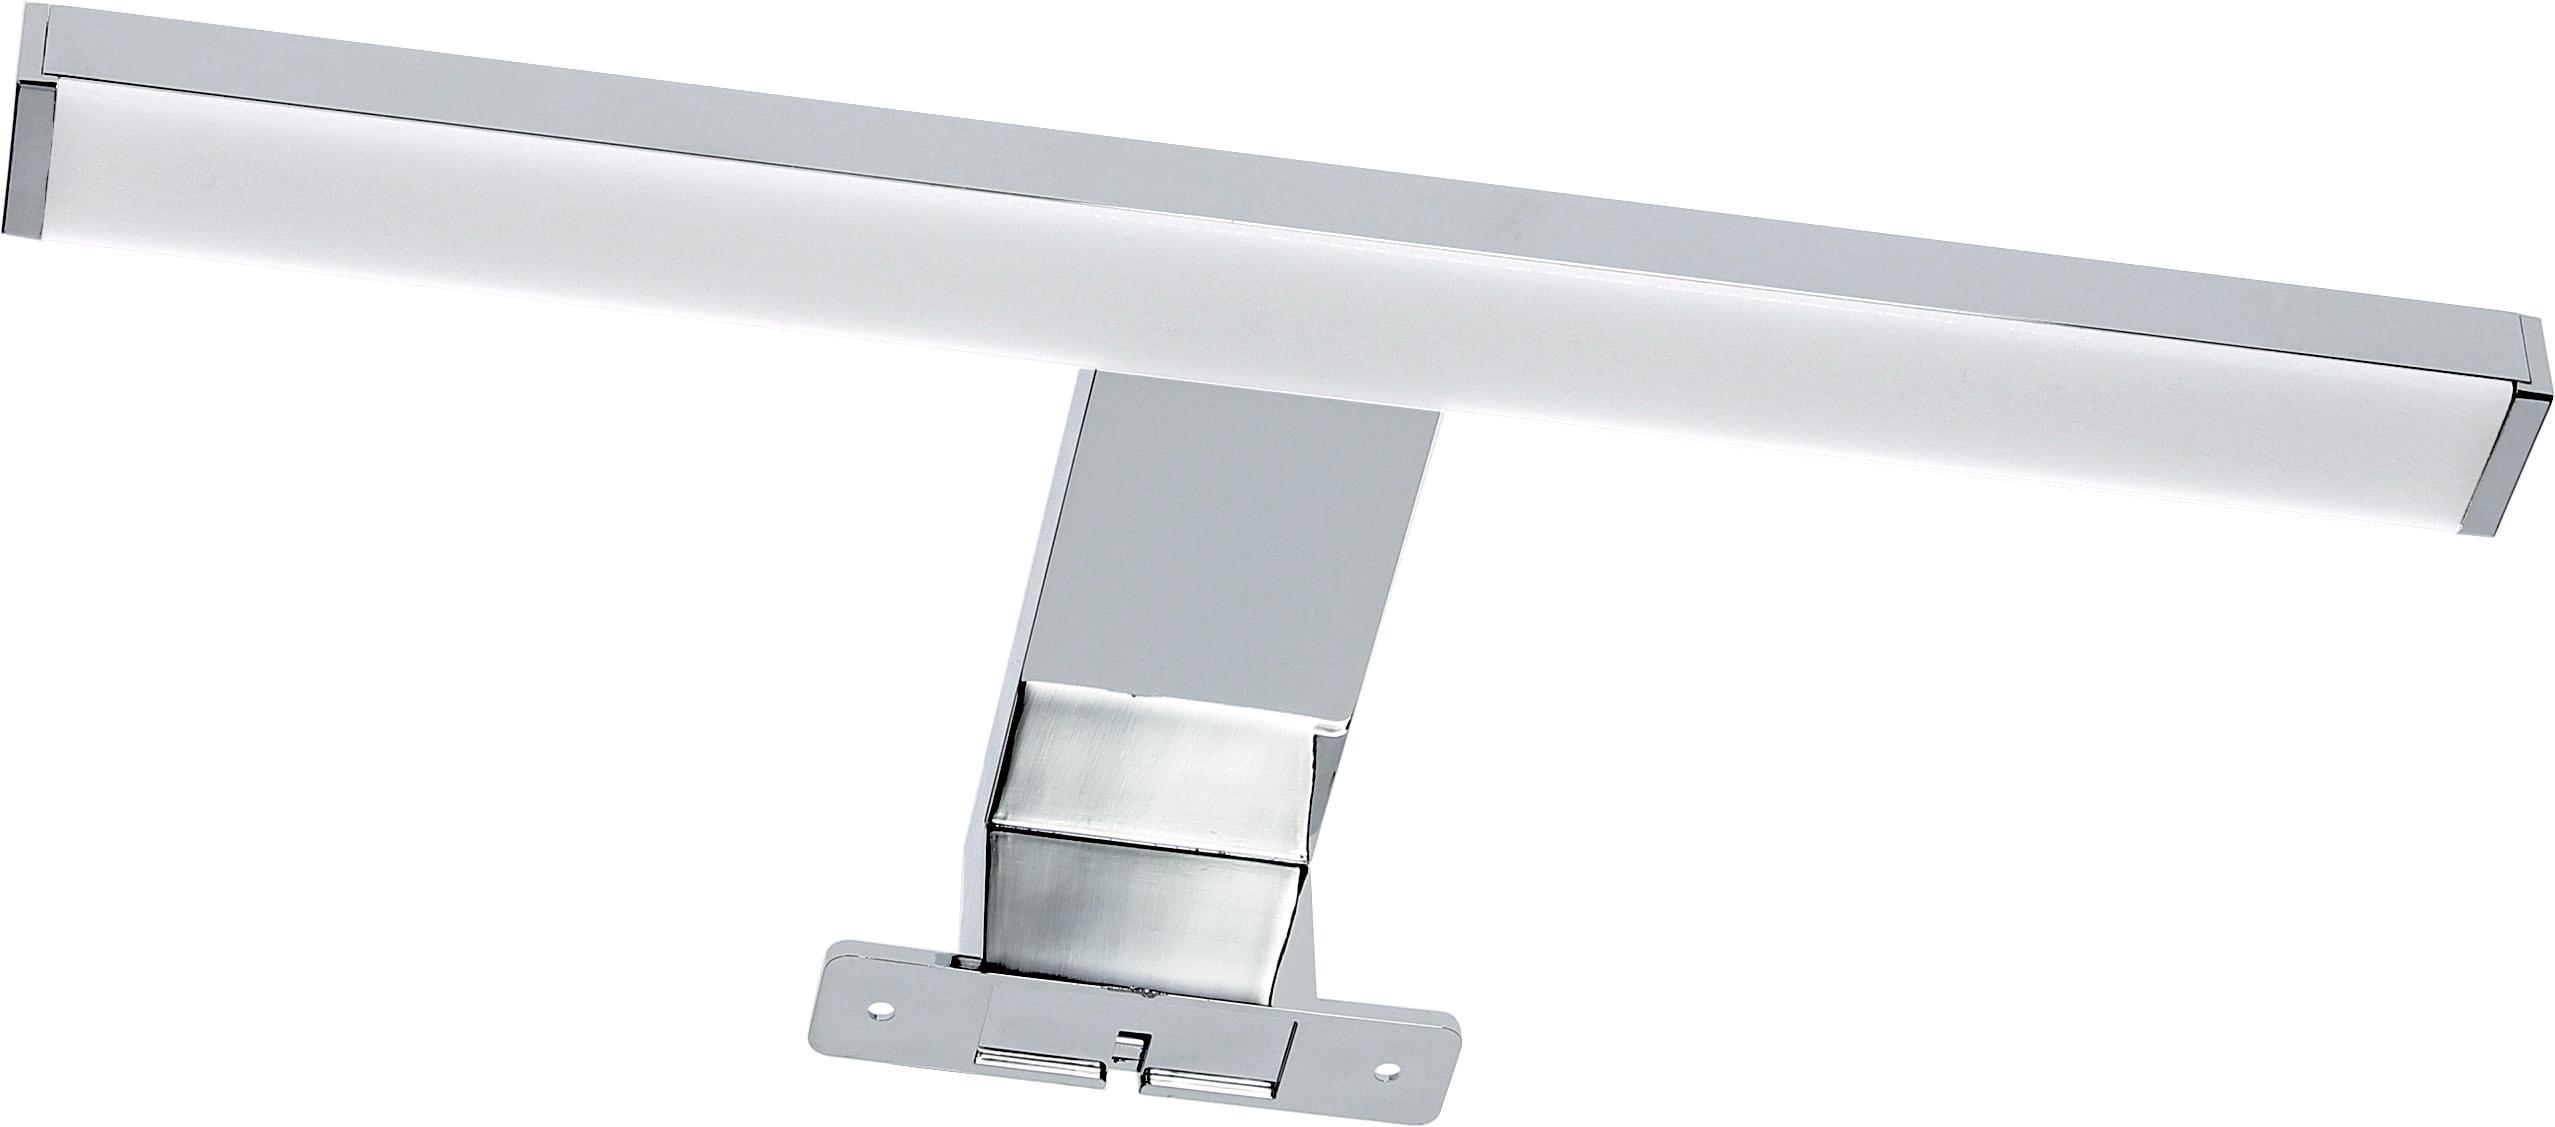 Kinkiet Mega chrom LED 7W